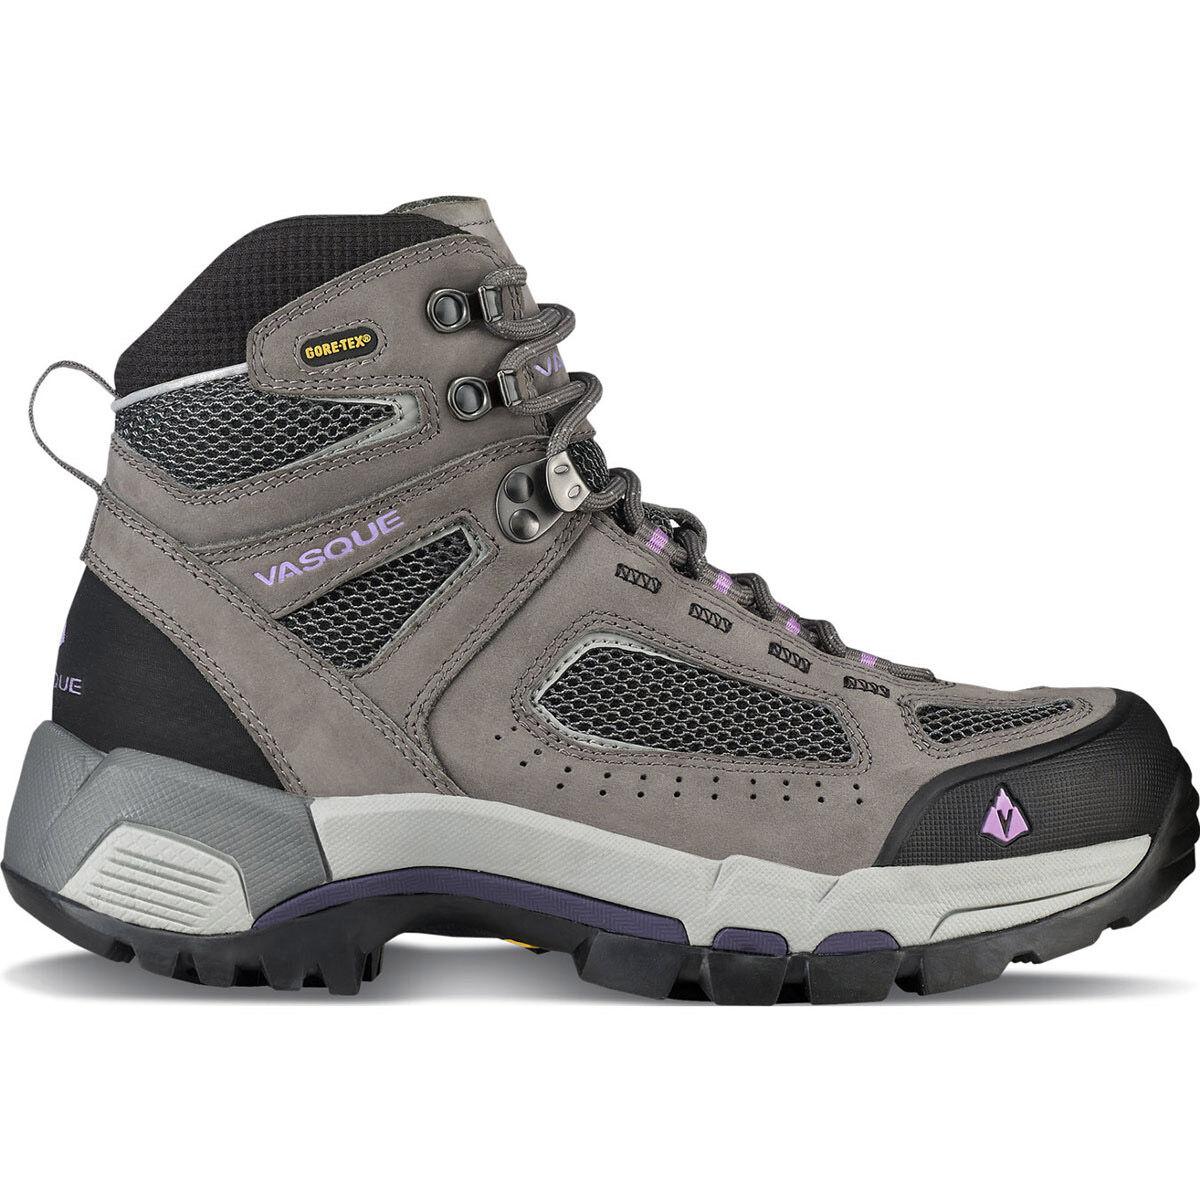 photo: Vasque Women's Breeze 2.0 Mid GTX hiking boot